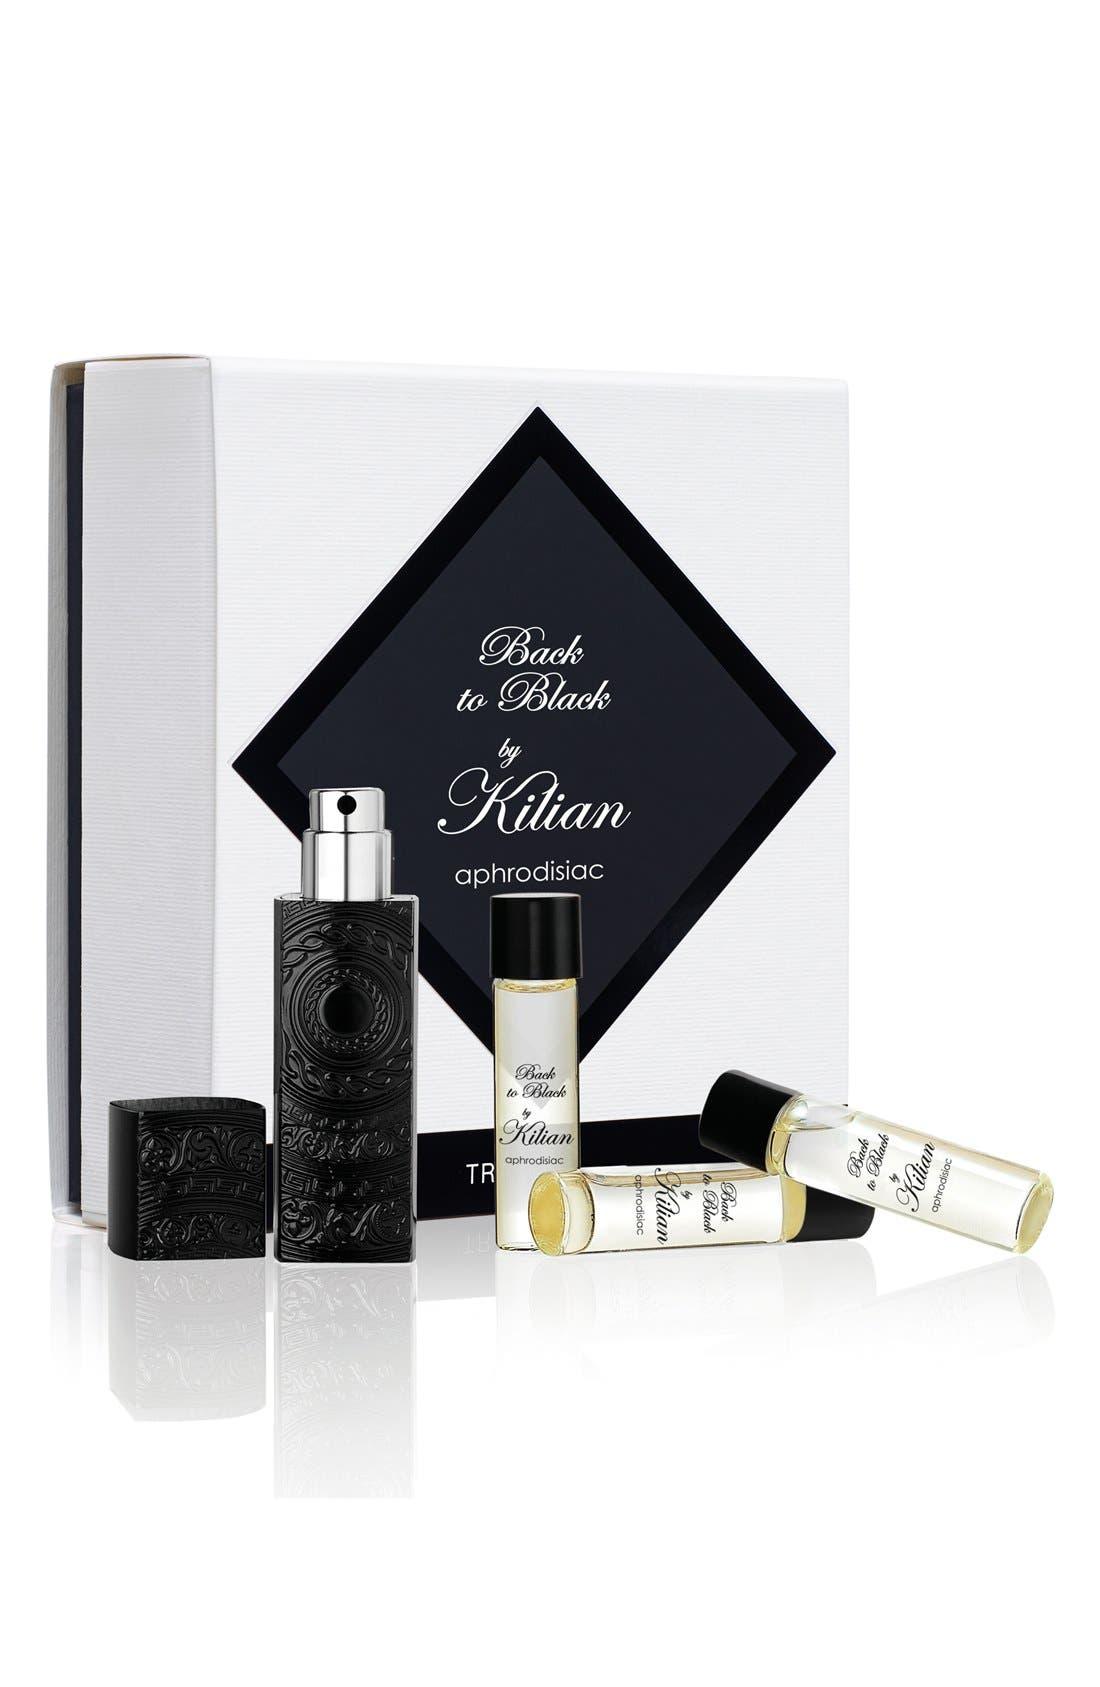 KILIAN, LOeuvre Noire - Back to Black, aphrodisiac Travel Set, Alternate thumbnail 2, color, NO COLOR